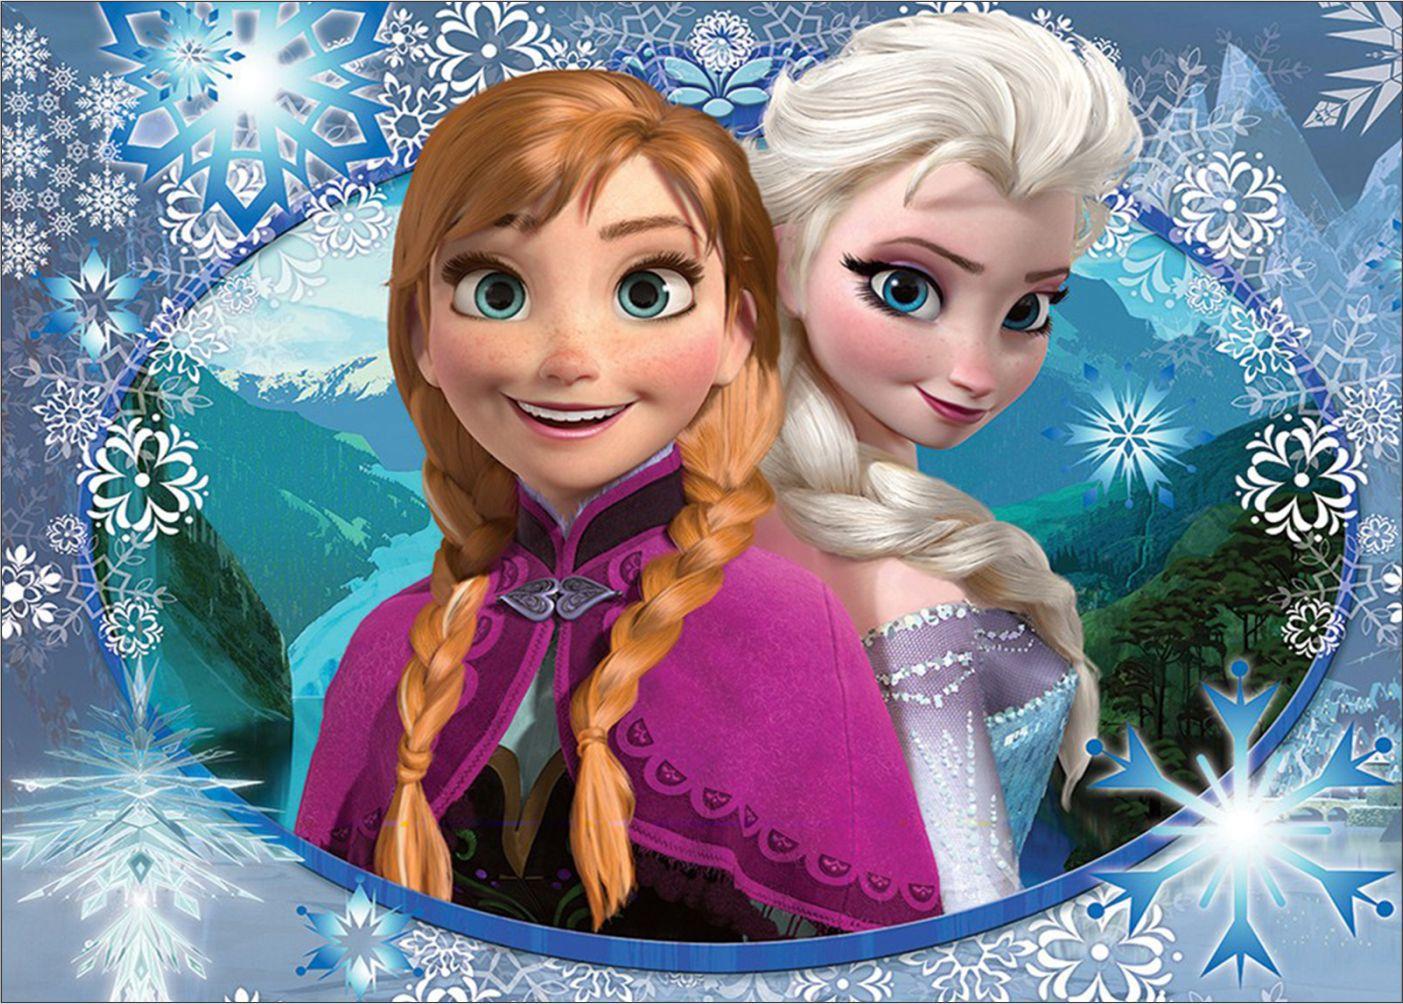 Papel de Parede Infantil Frozen 0001 - Papel de Parede para Quarto  - Paredes Decoradas